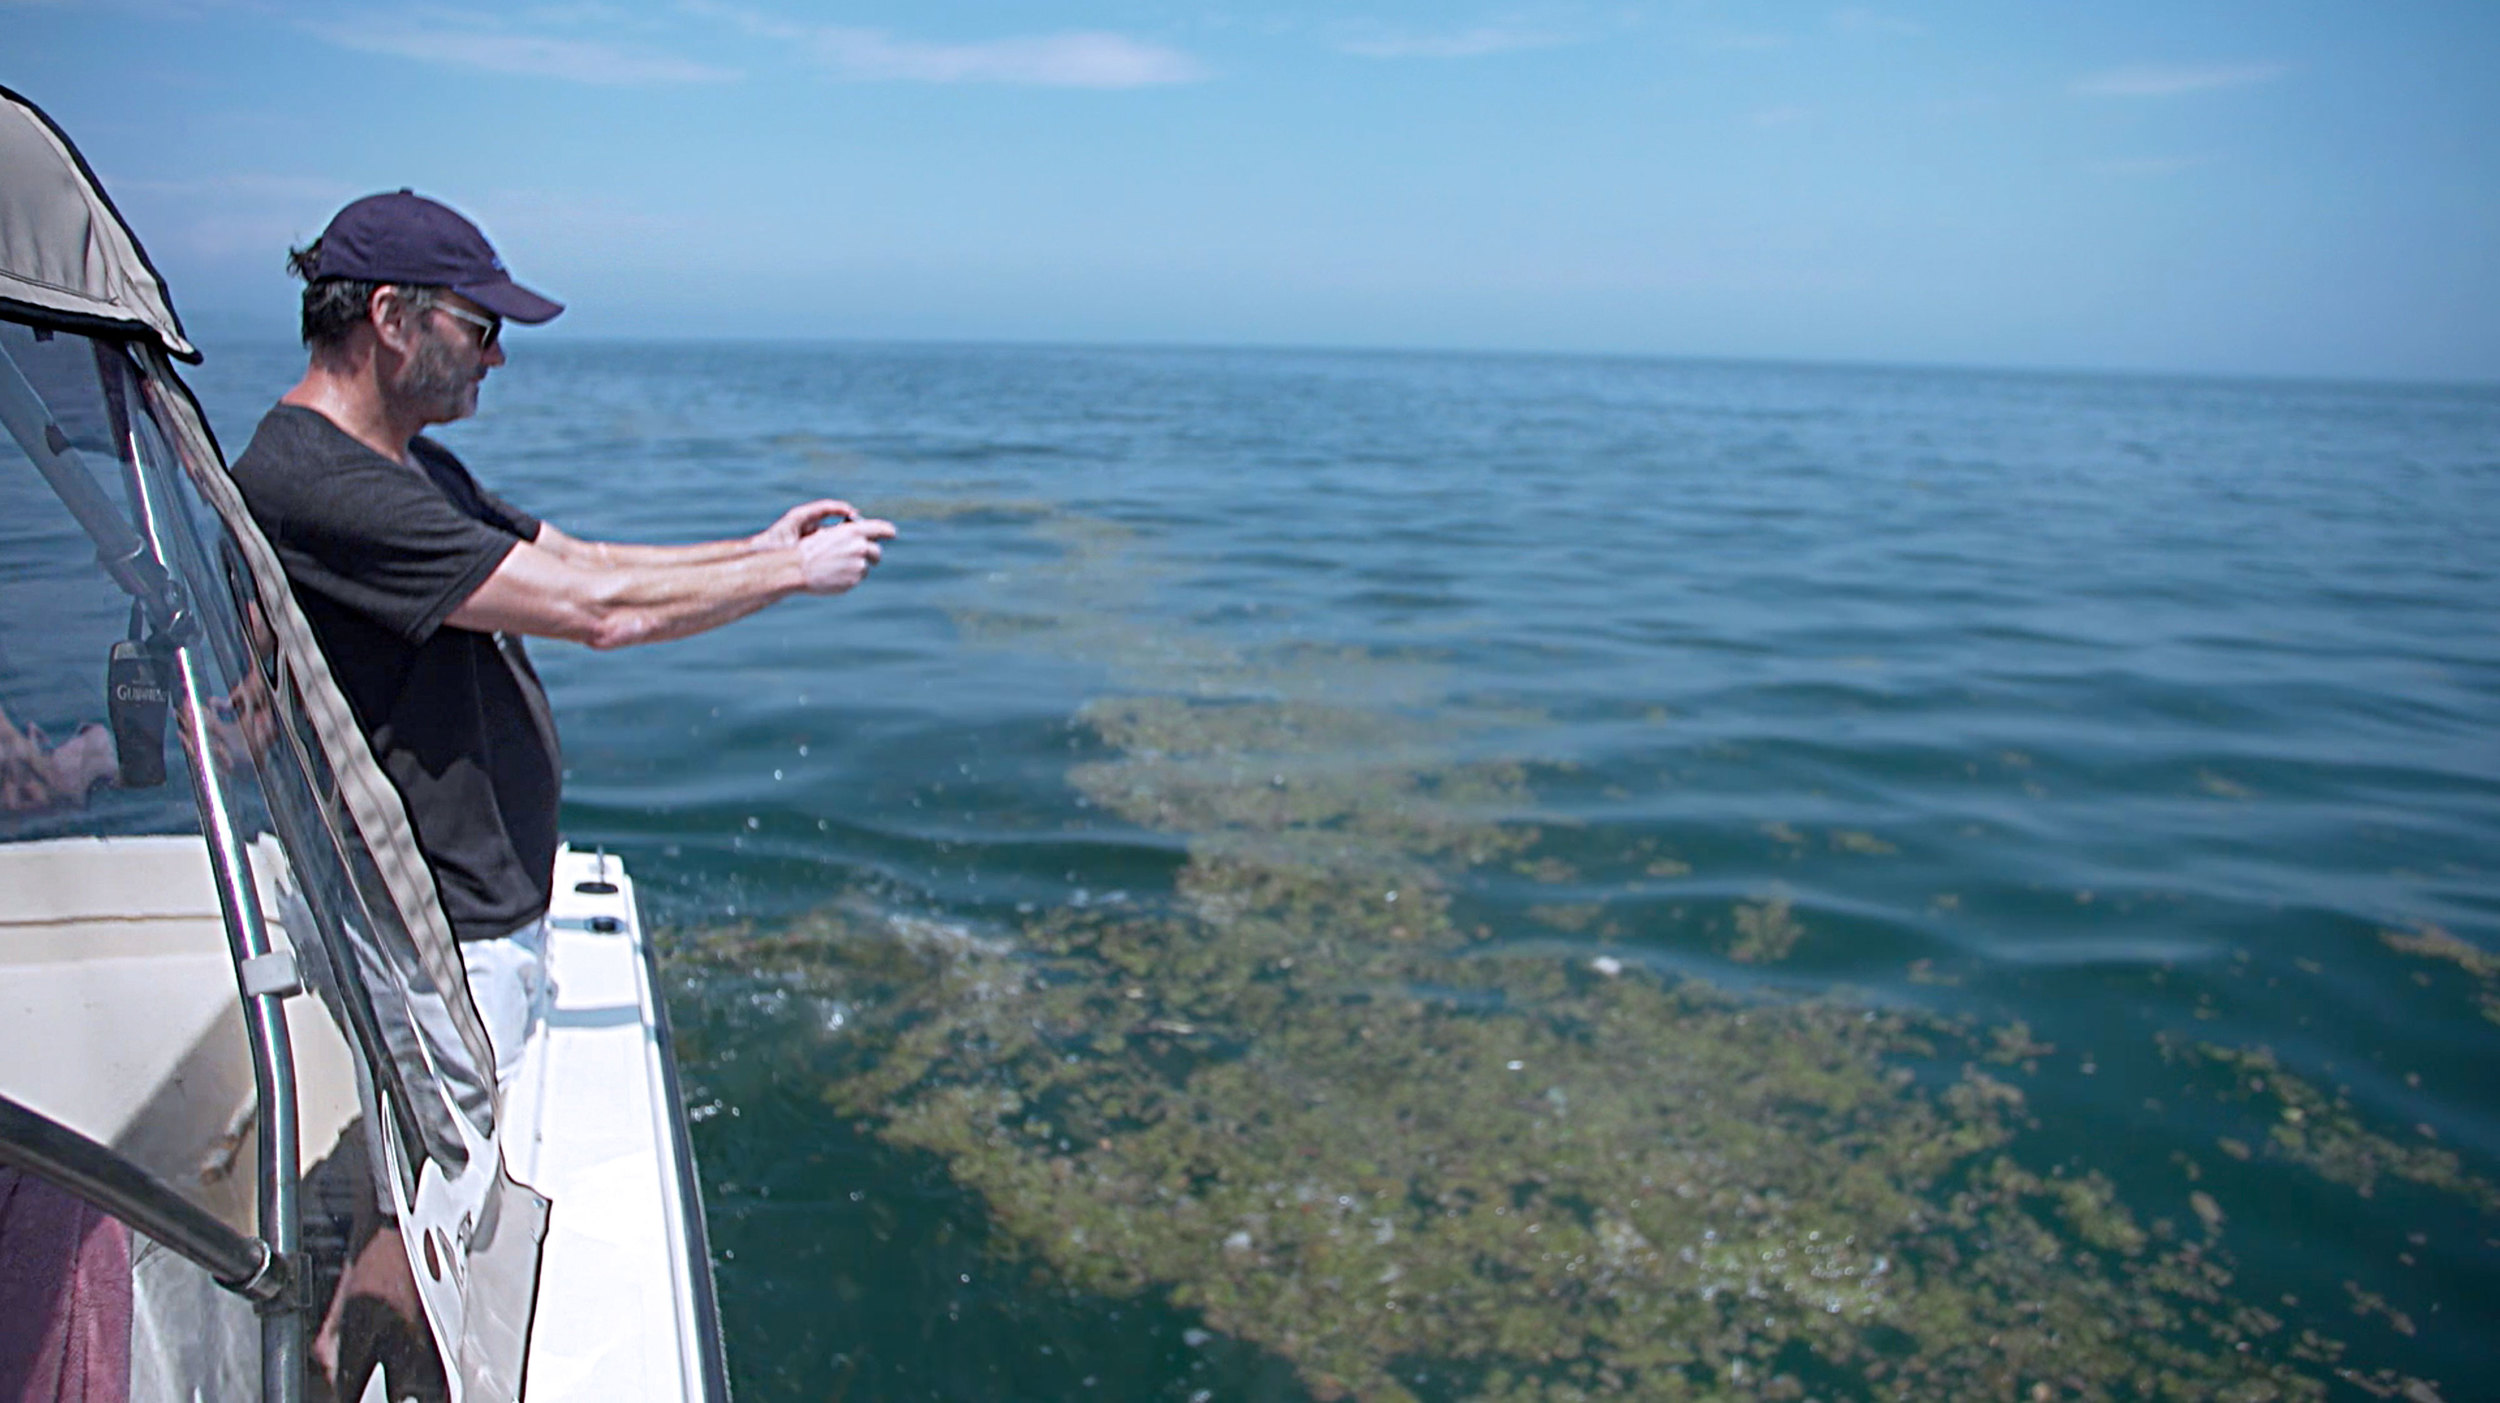 Mark Mattson taking photos of sewage debris while traveling back to Toronto by boat. (Image via Brett Rogers)